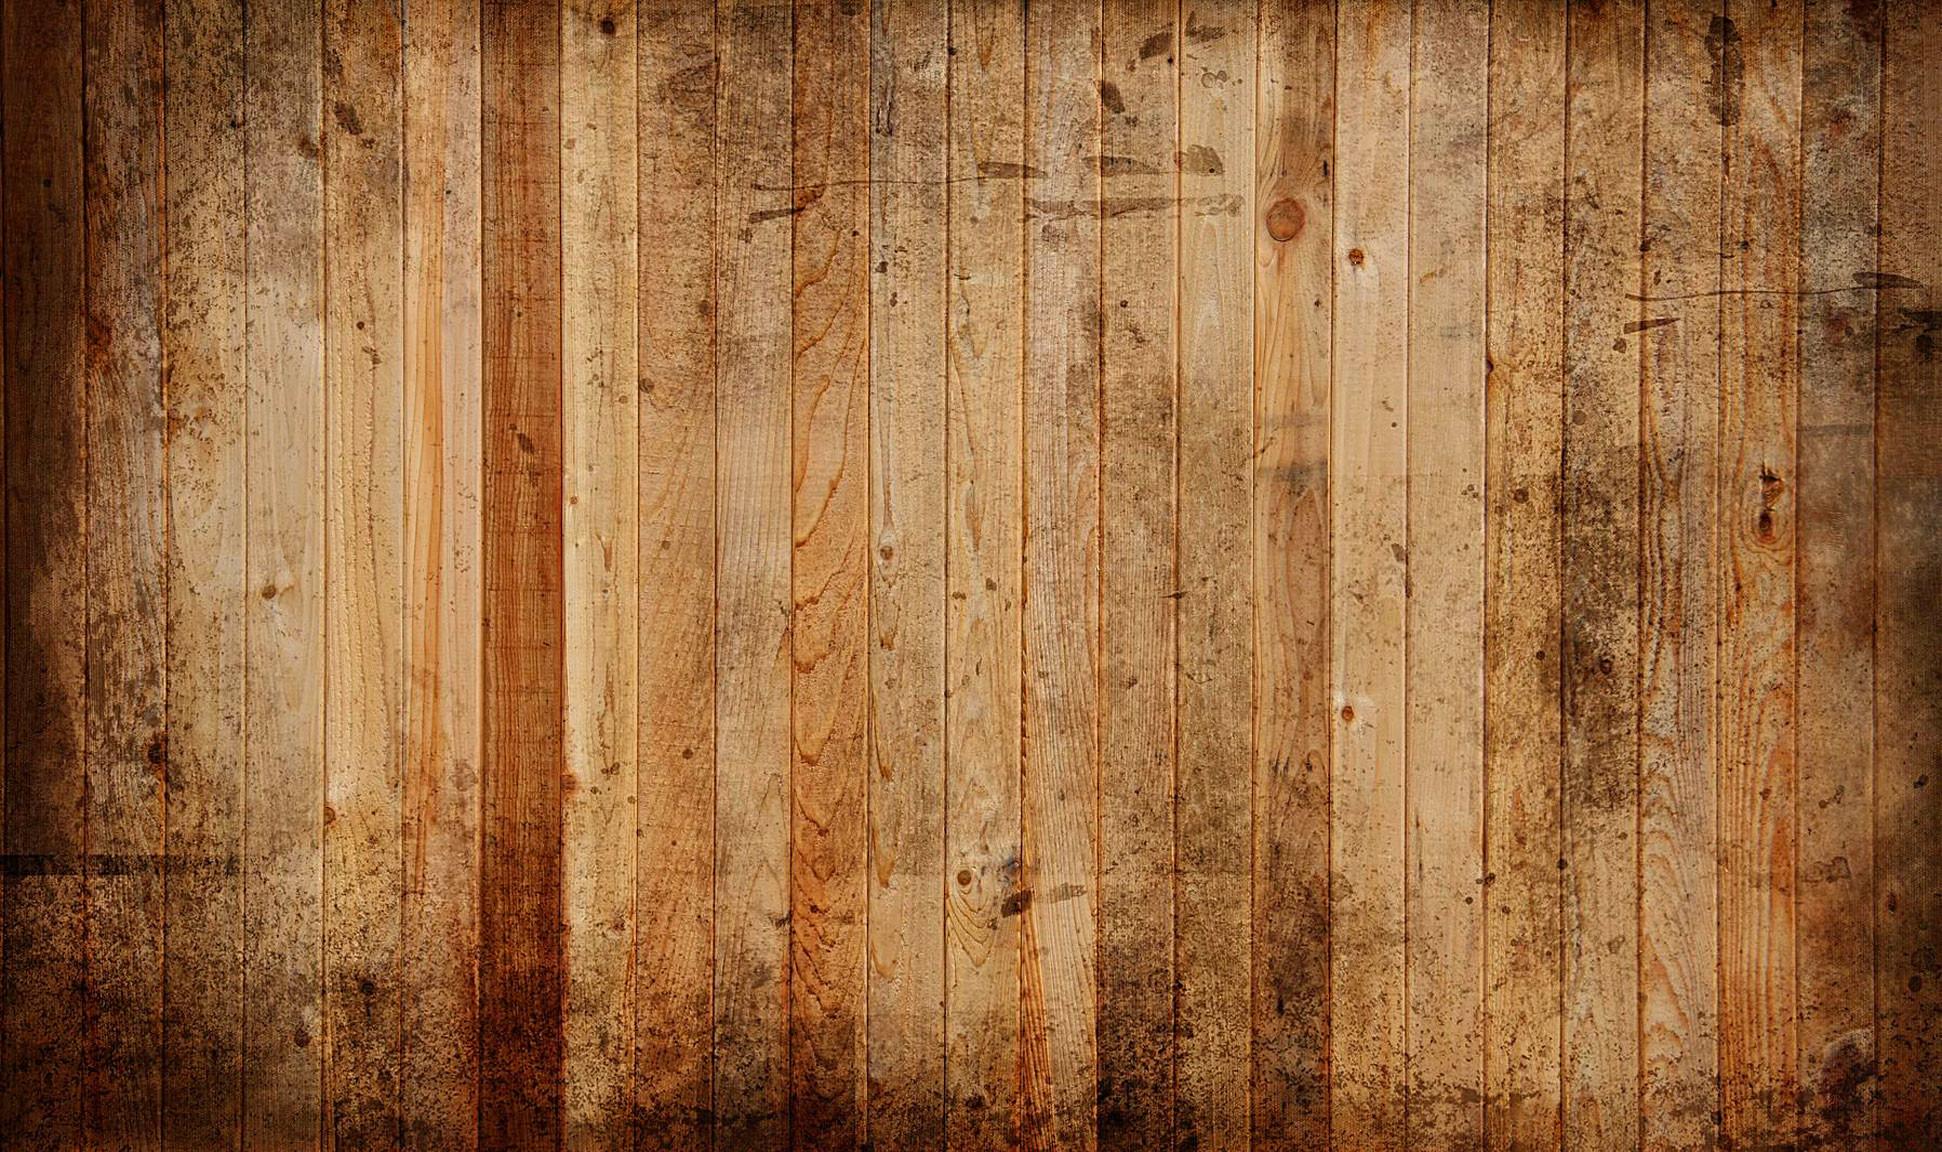 Rustic Wood Wallpaper Widescreen Brown 1920×1080 Iphone Teal Light .